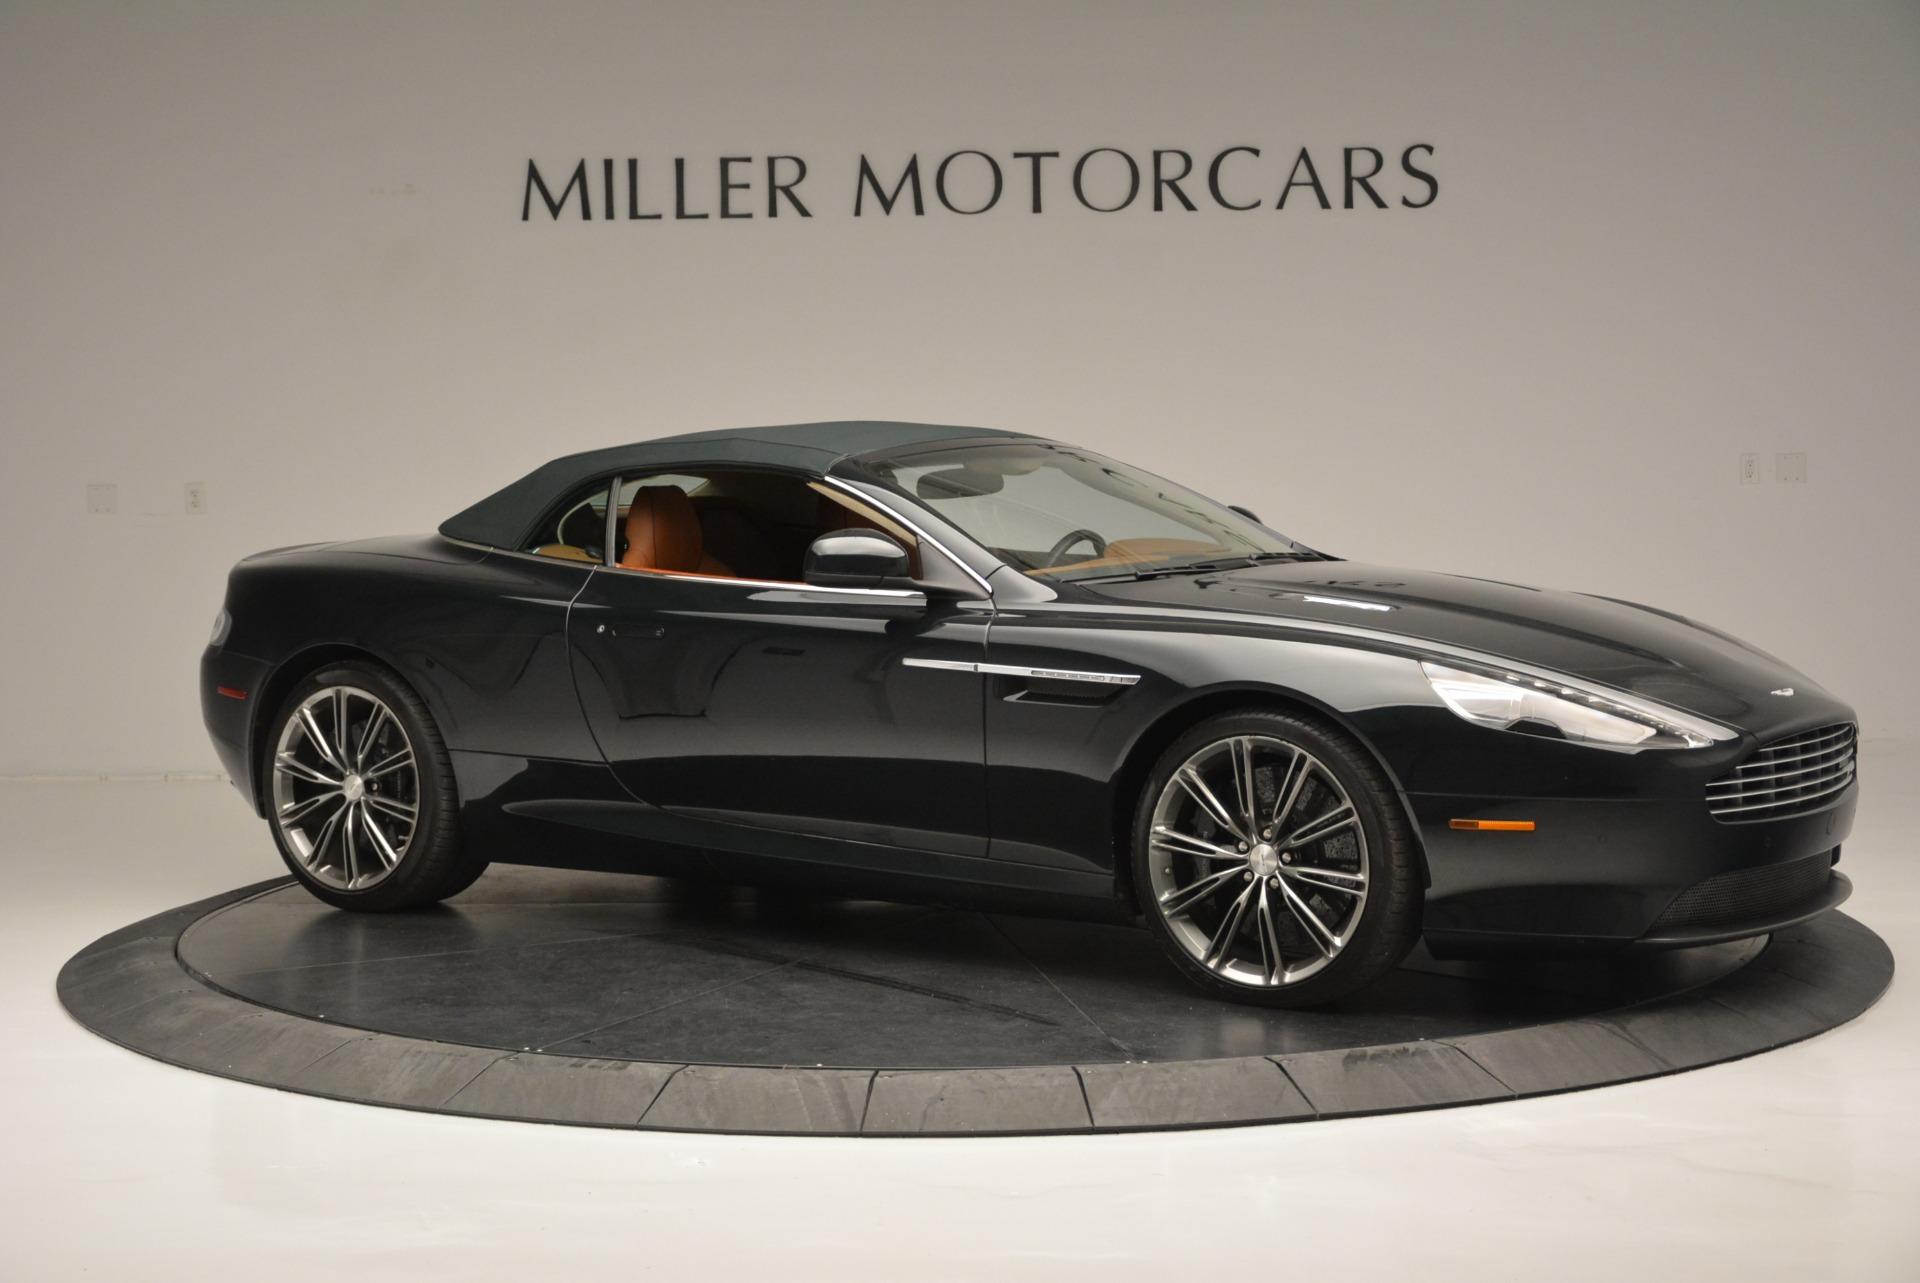 Used 2012 Aston Martin Virage Volante For Sale In Westport, CT 2508_p17